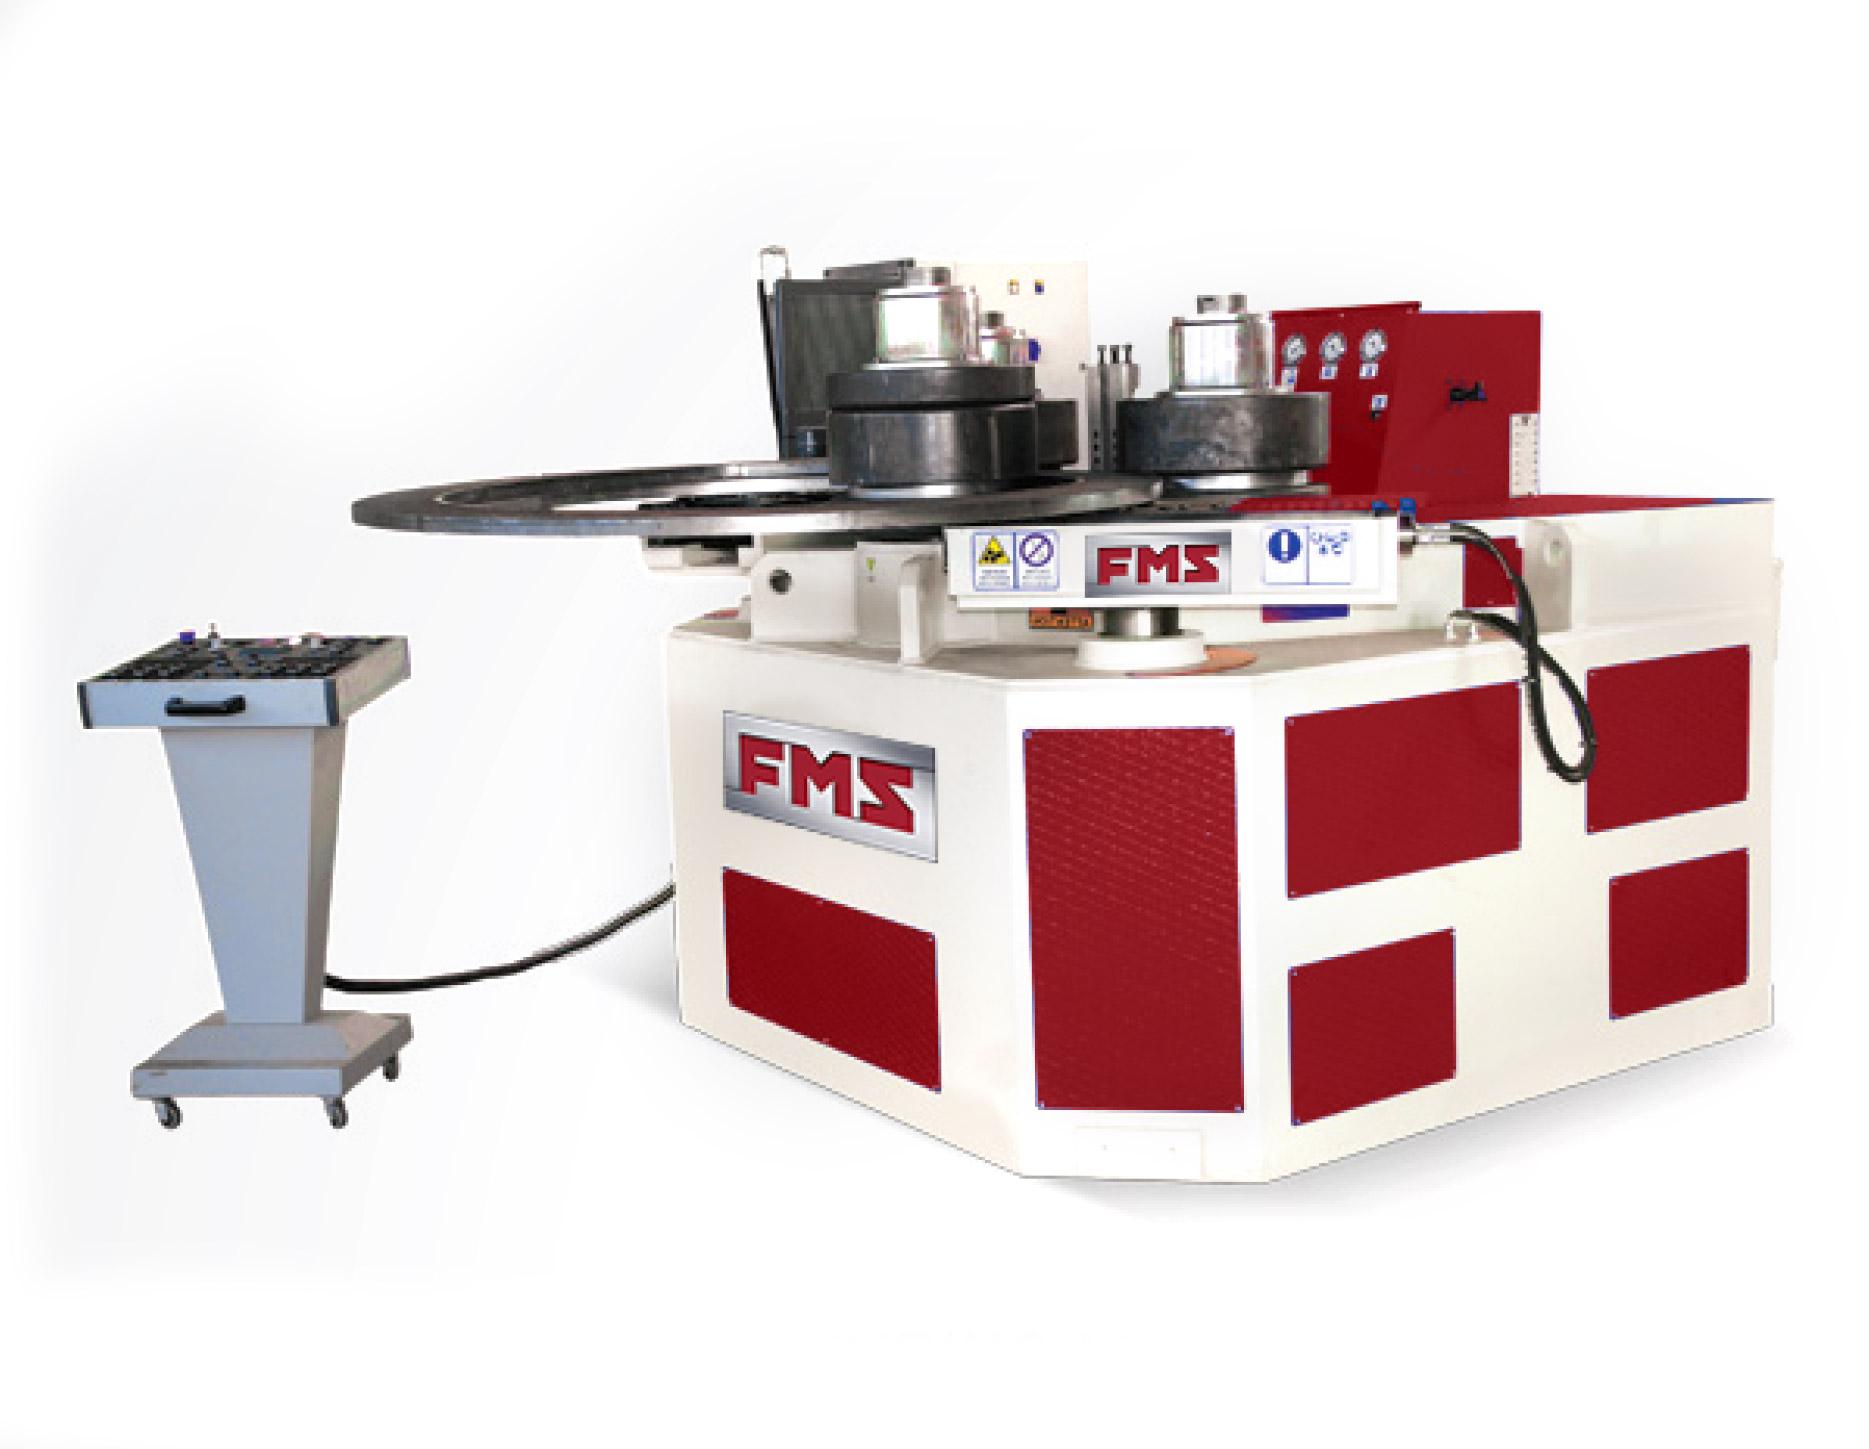 FMS 240 HYDRAULIC PROFILE BENDING MACHINE